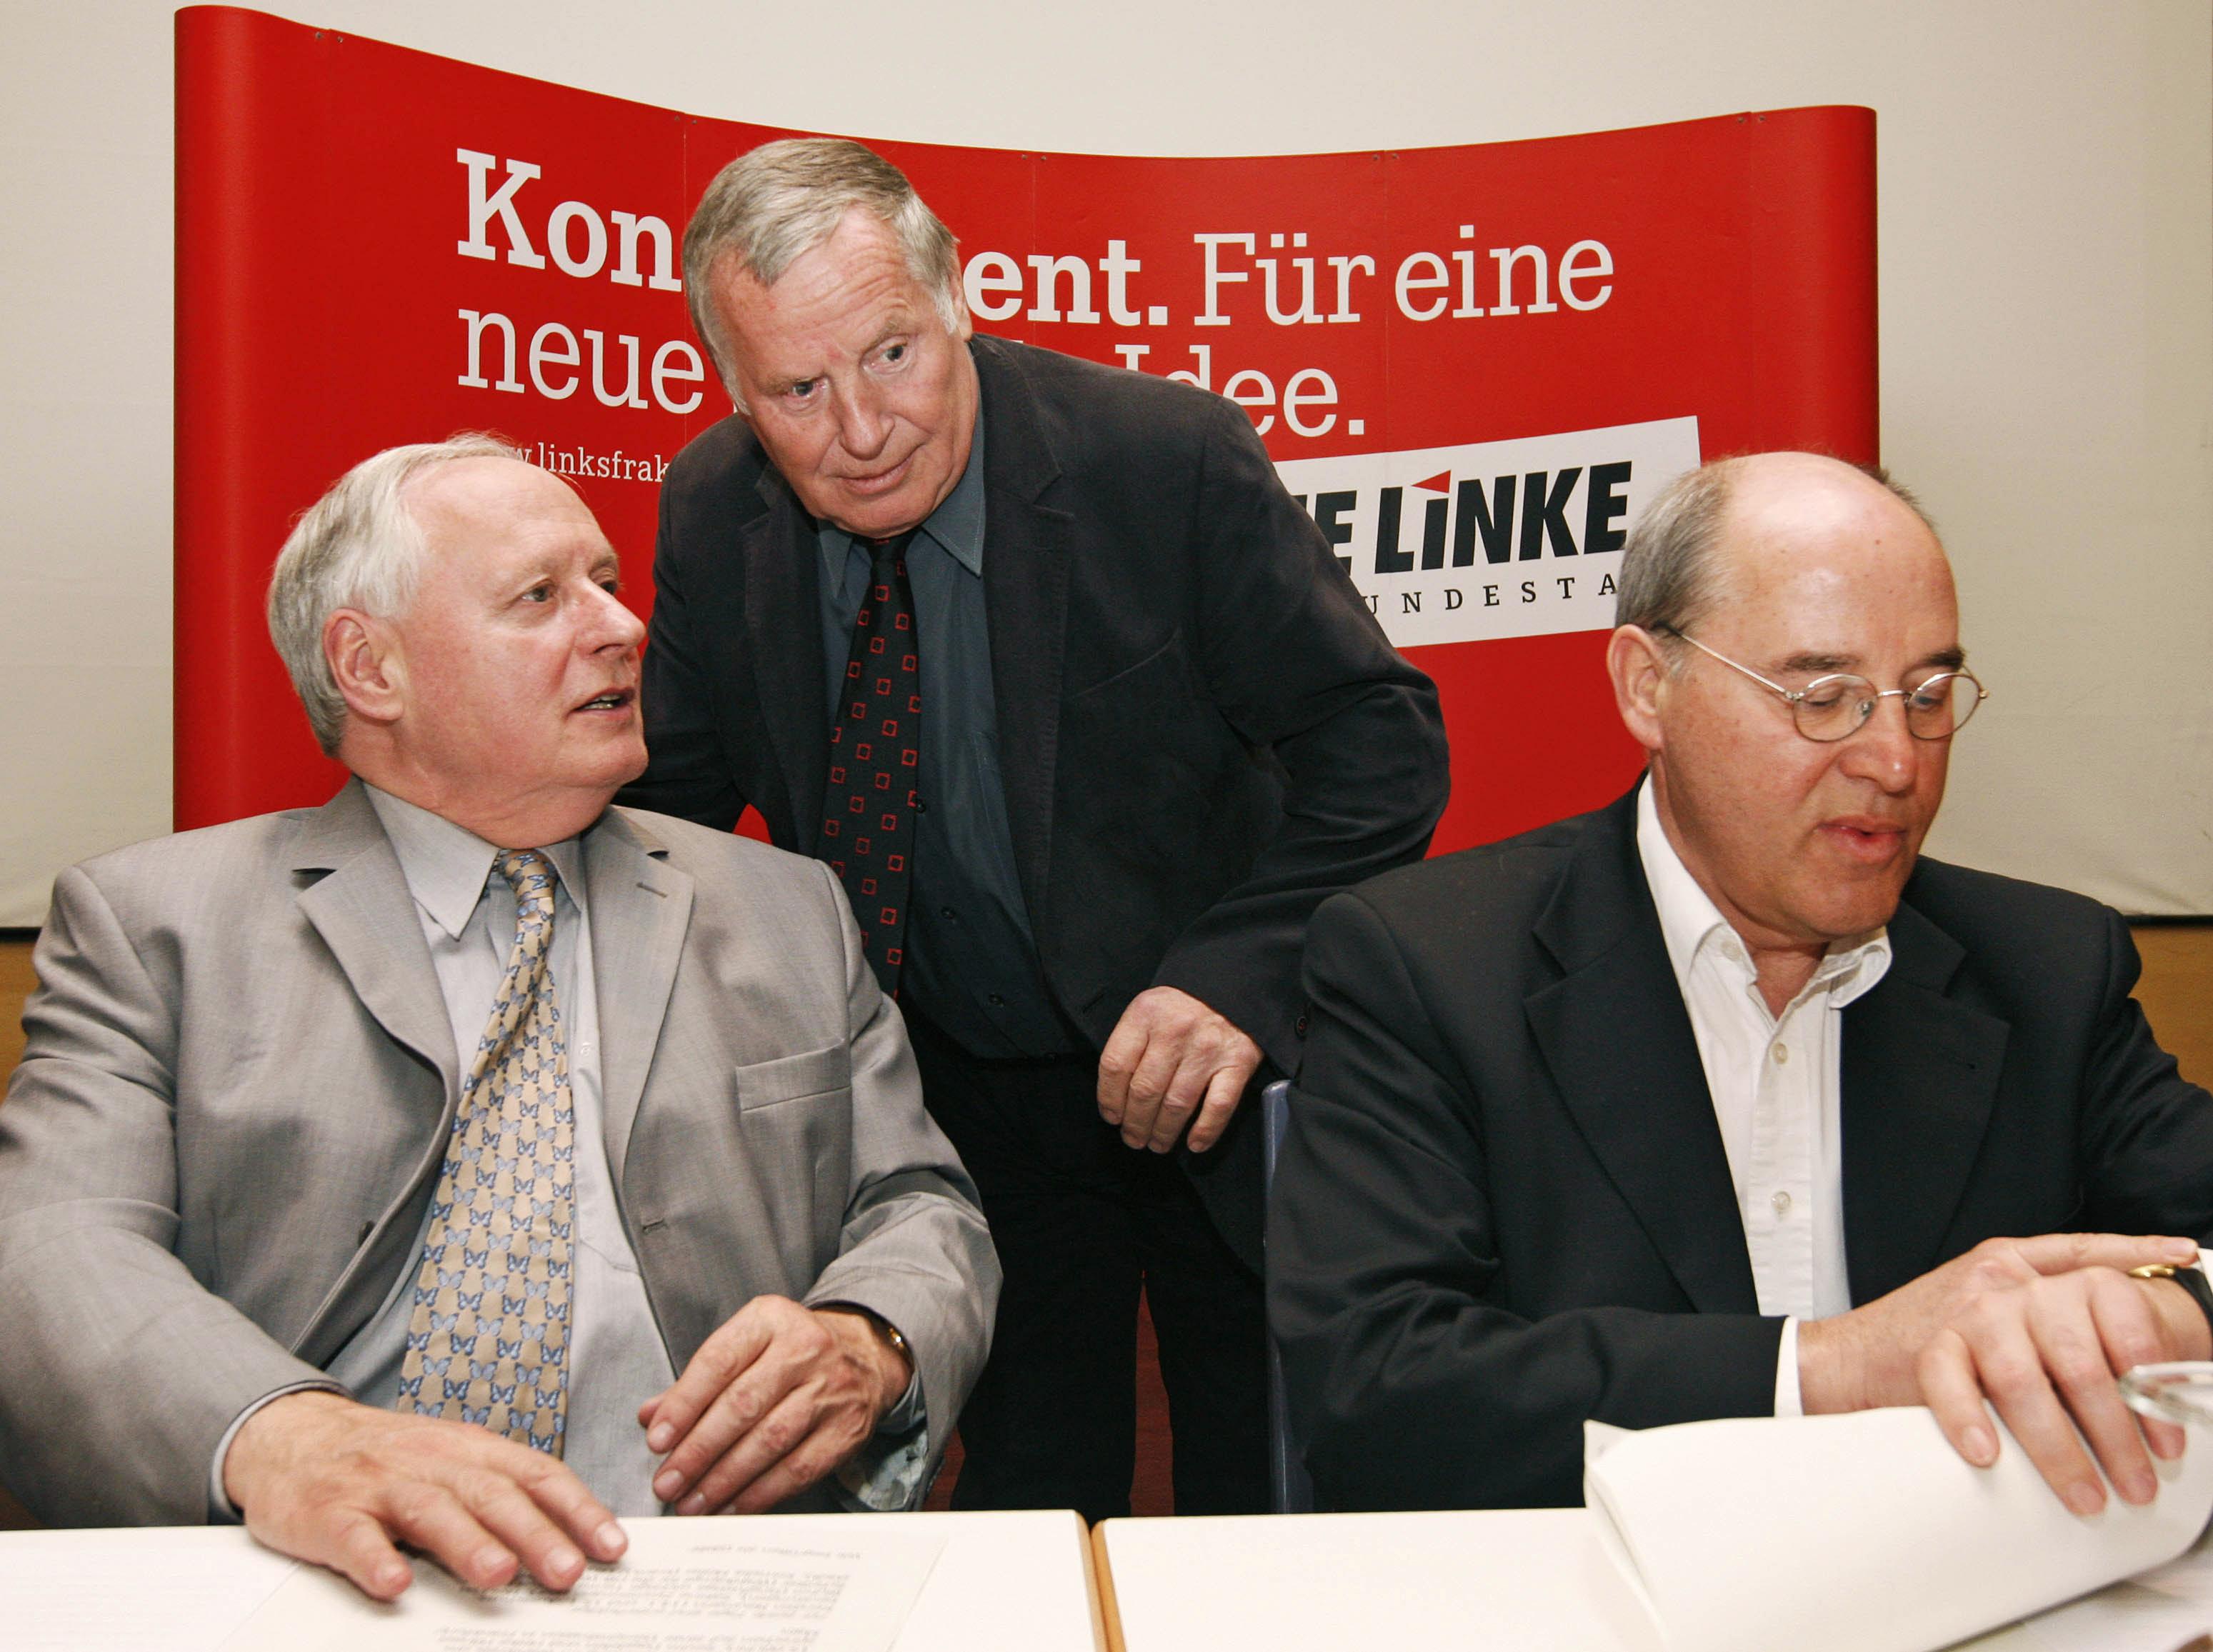 Landtagsabgeordnete der Linken soll Mandat zurückgeben